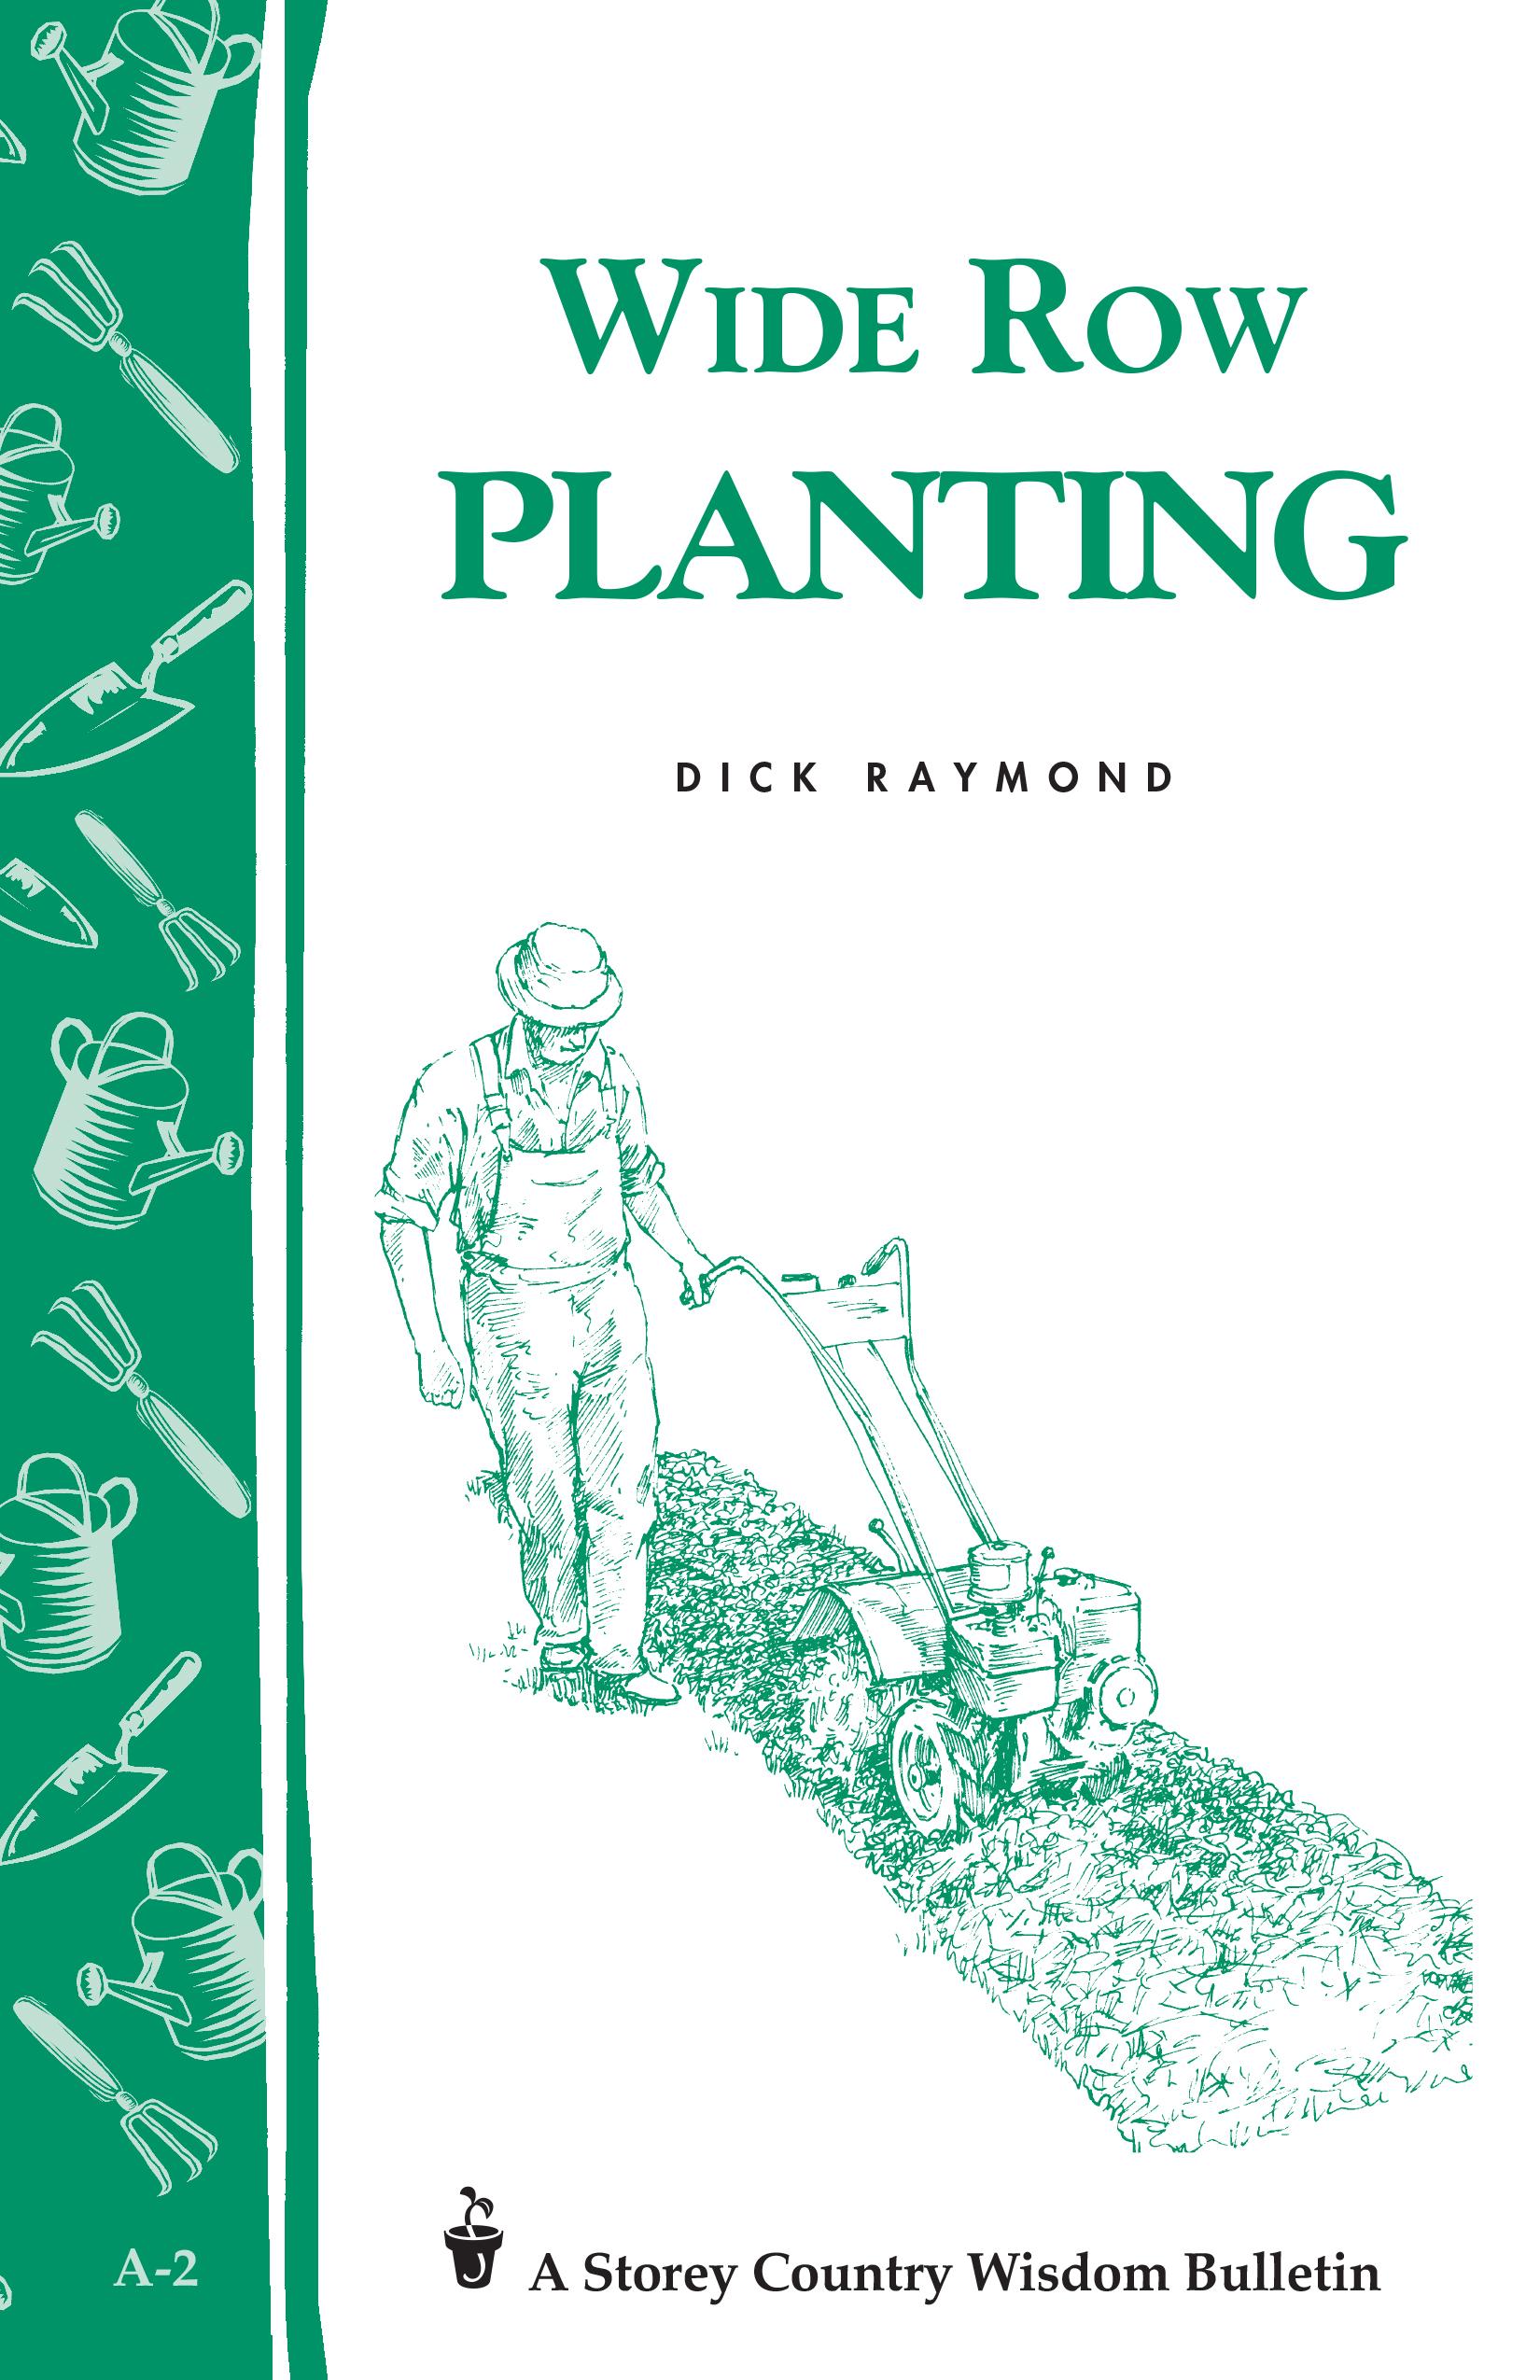 Wide Row Planting Storey's Country Wisdom Bulletin A-02 - Dick Raymond